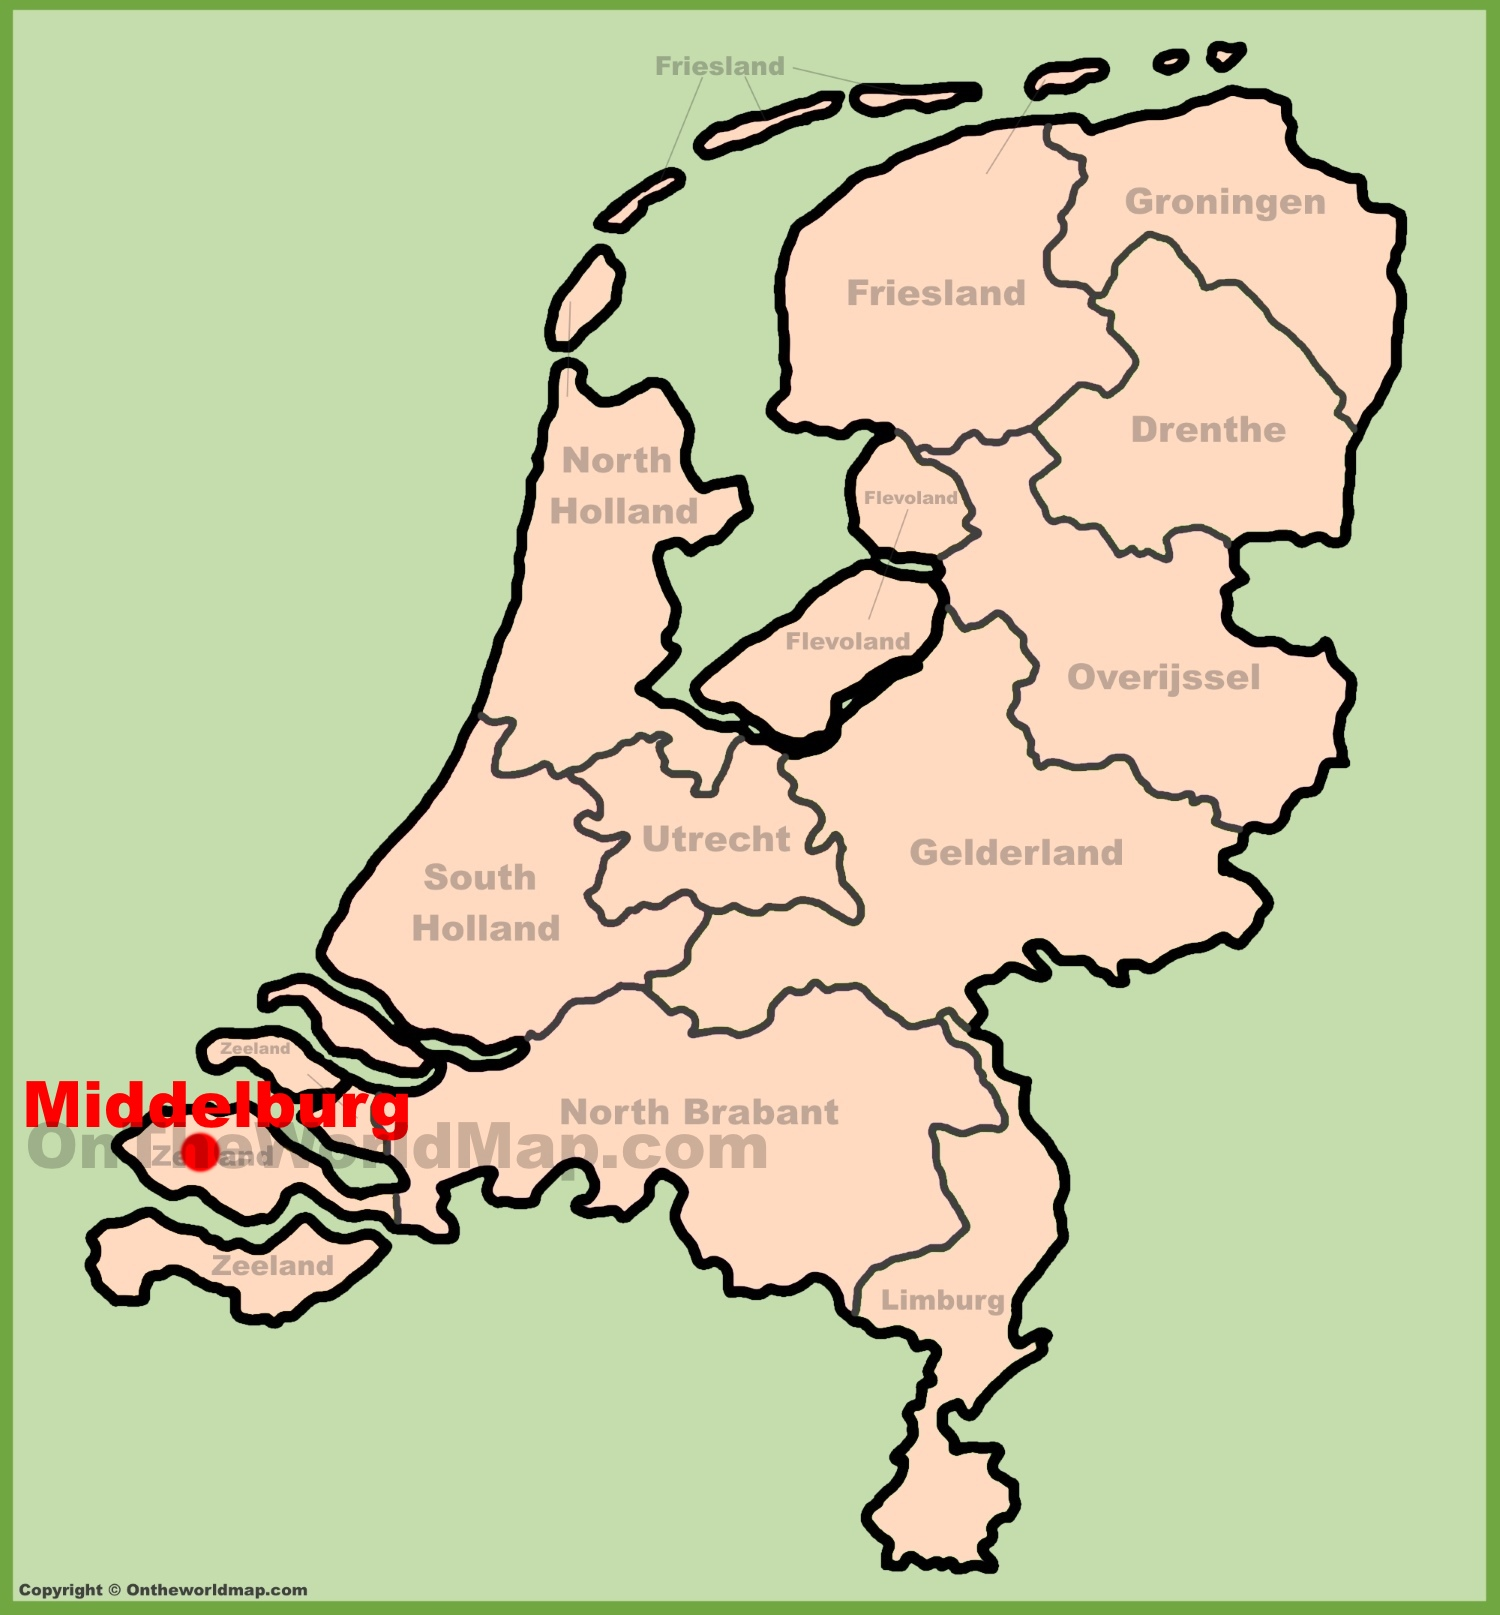 Middelburg location on the Netherlands map